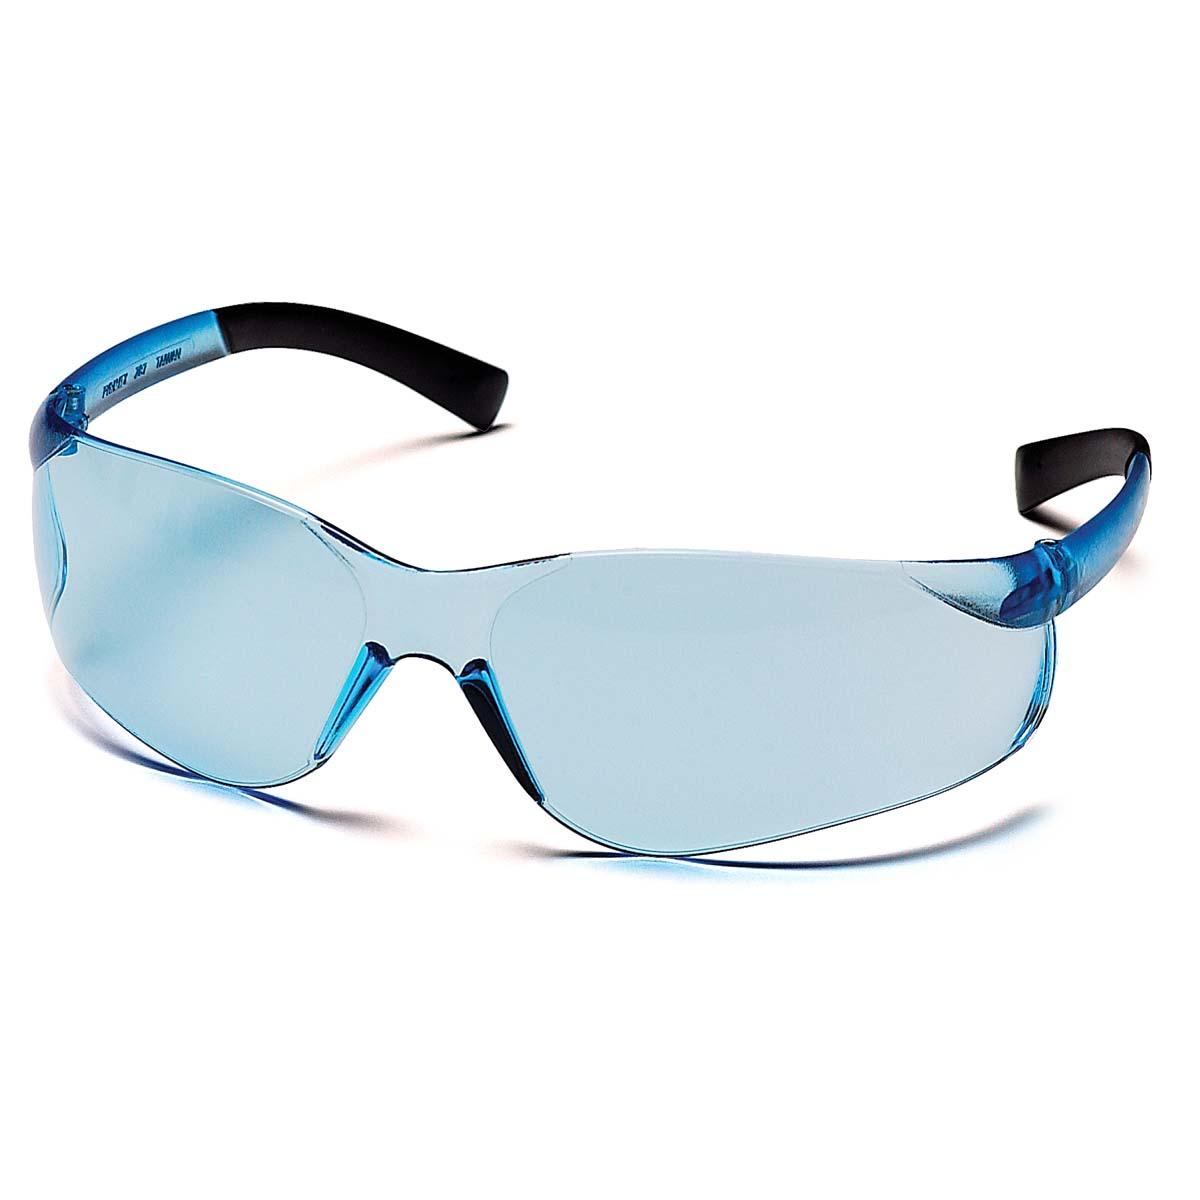 Infinity Blue Frame/Infinity Blue Lens